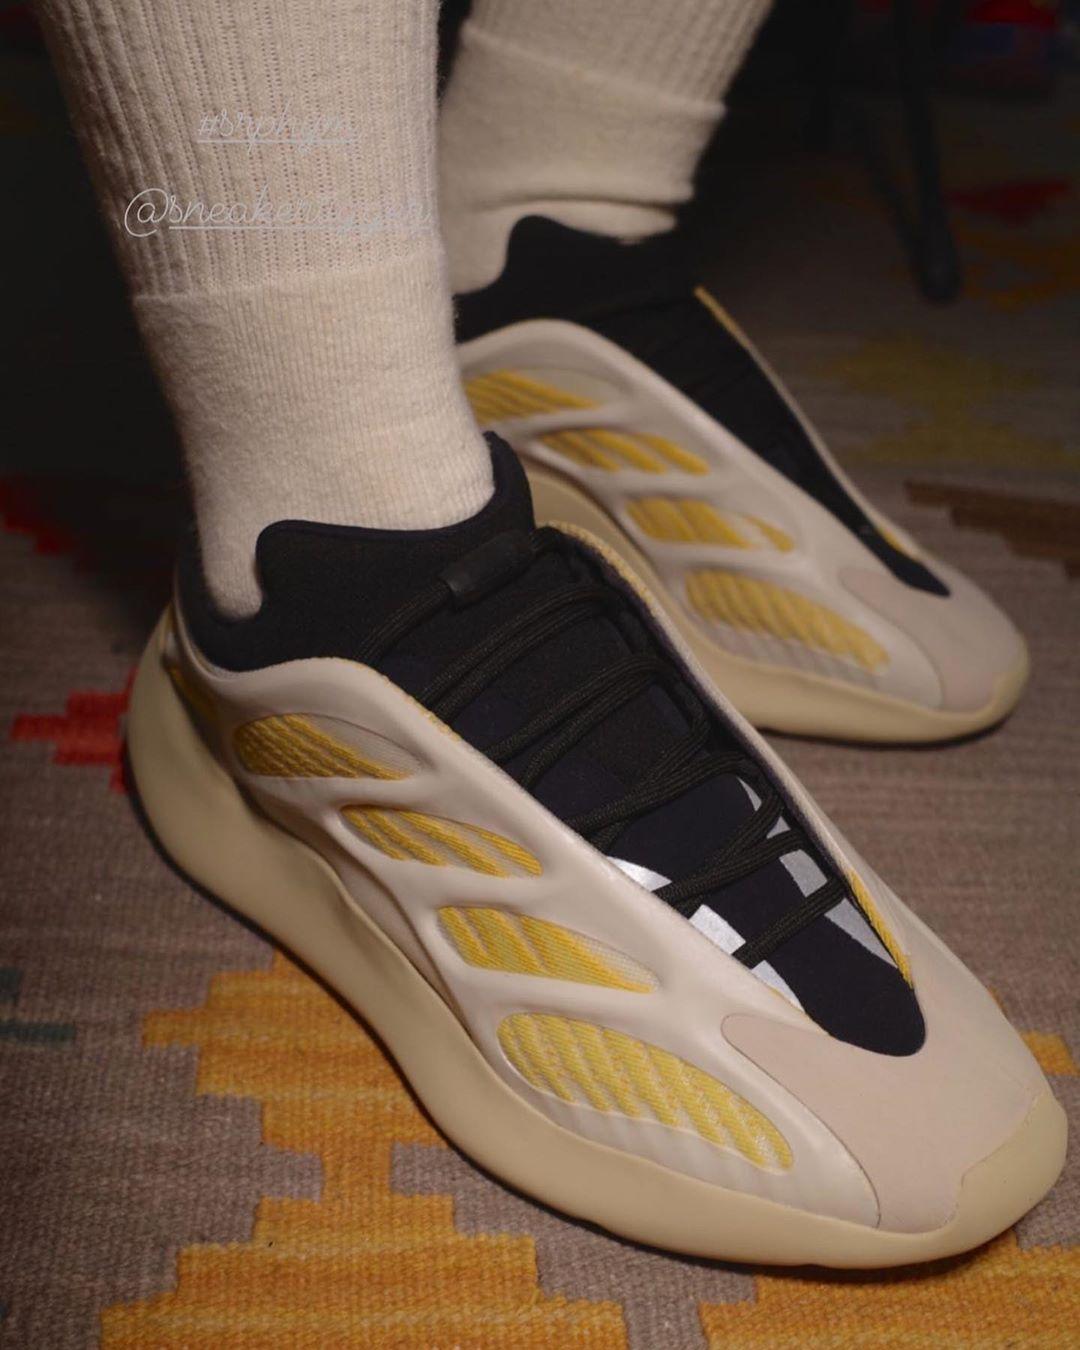 "YEEZY 700 V3 ""SAFFLOWER"" giày thể thao"